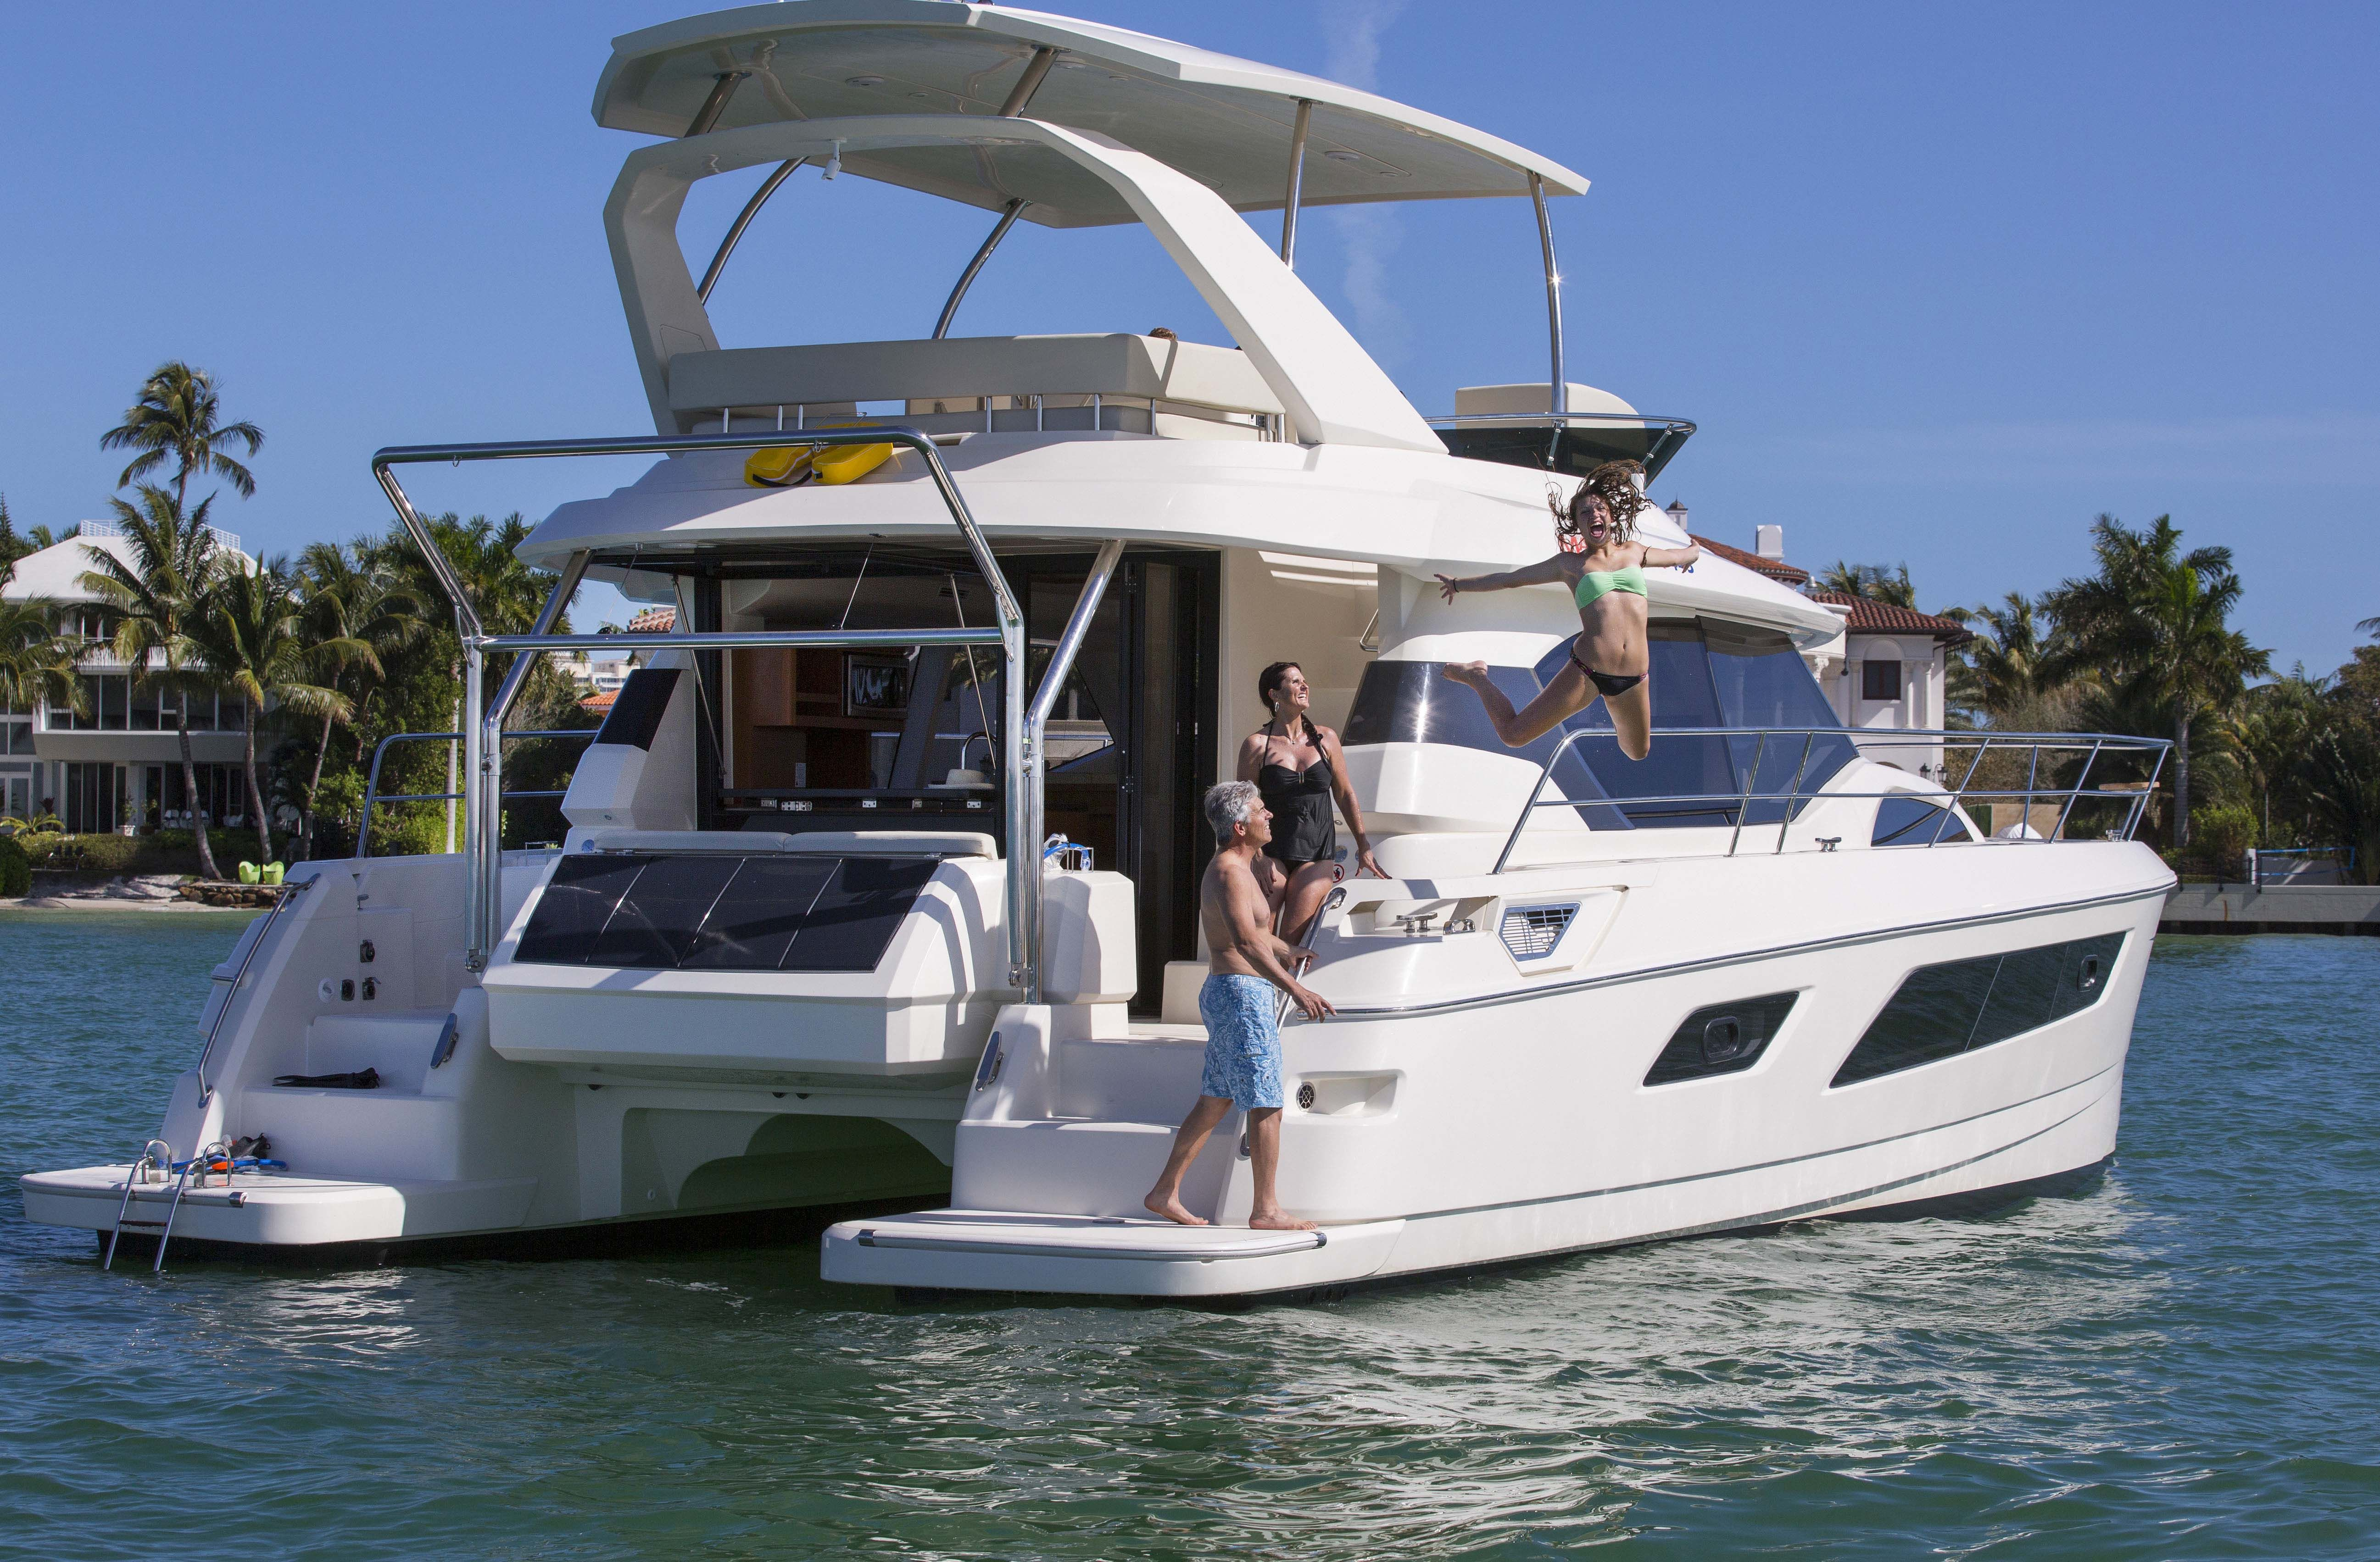 Marinemax Charters Fleet Power Yachts 44 Catamaran Catamaran Yacht Yacht Sailing Catamaran